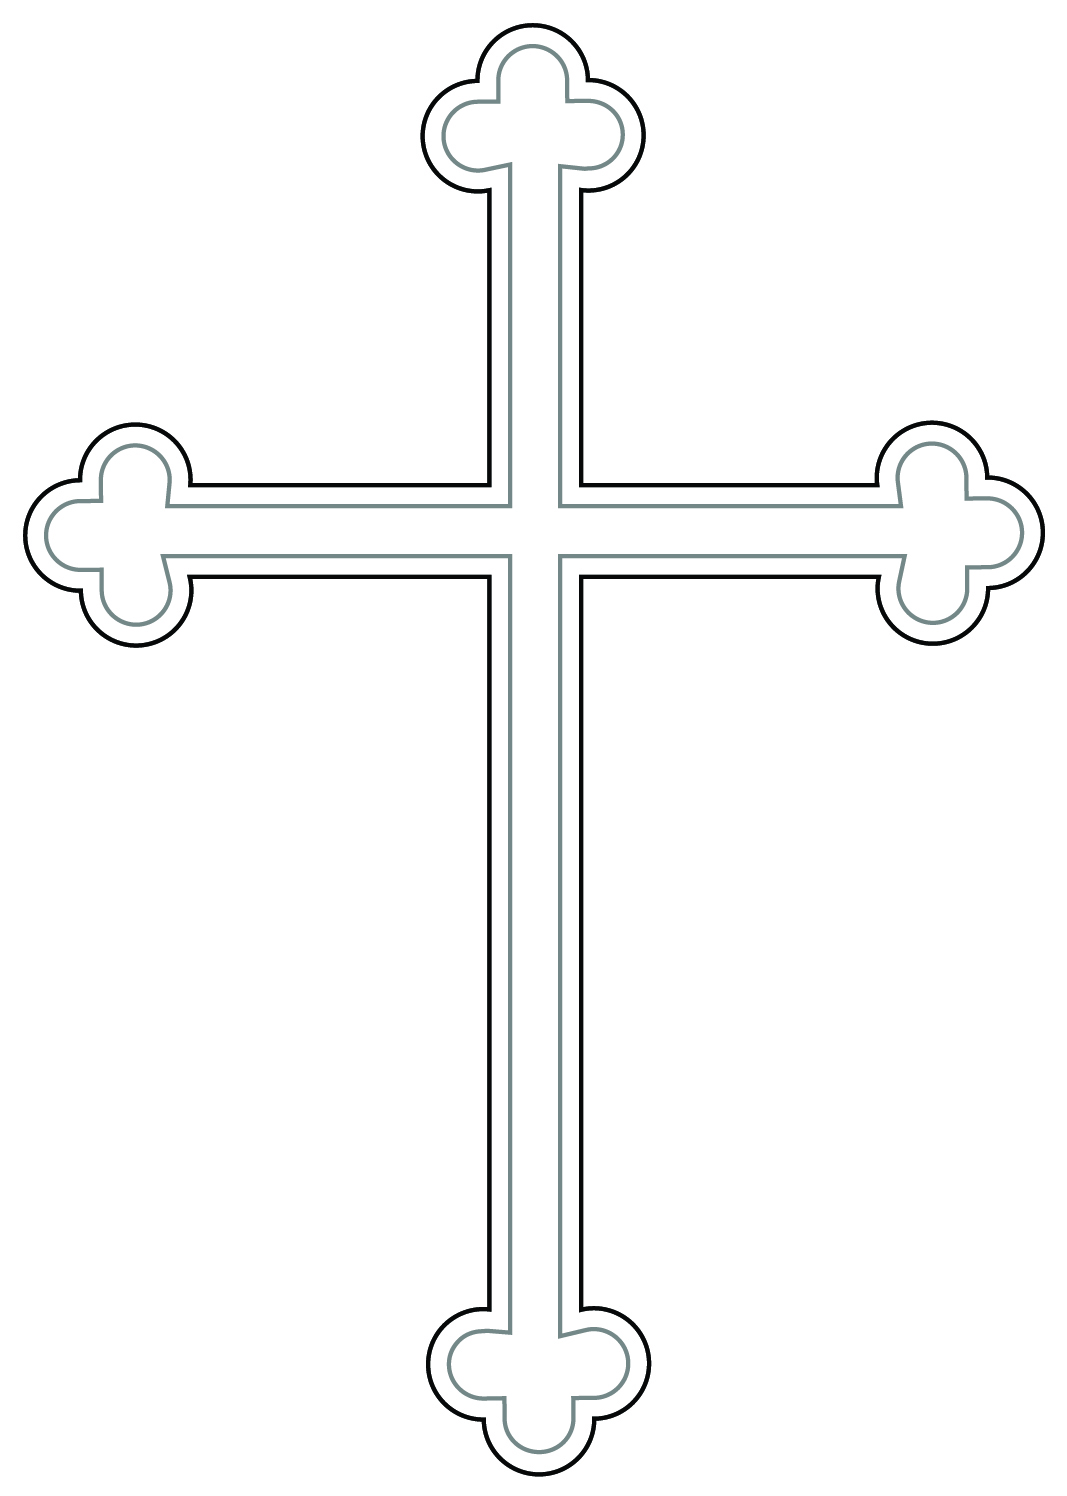 Free Baptism Cross Cliparts, Download Free Clip Art, Free Clip Art.